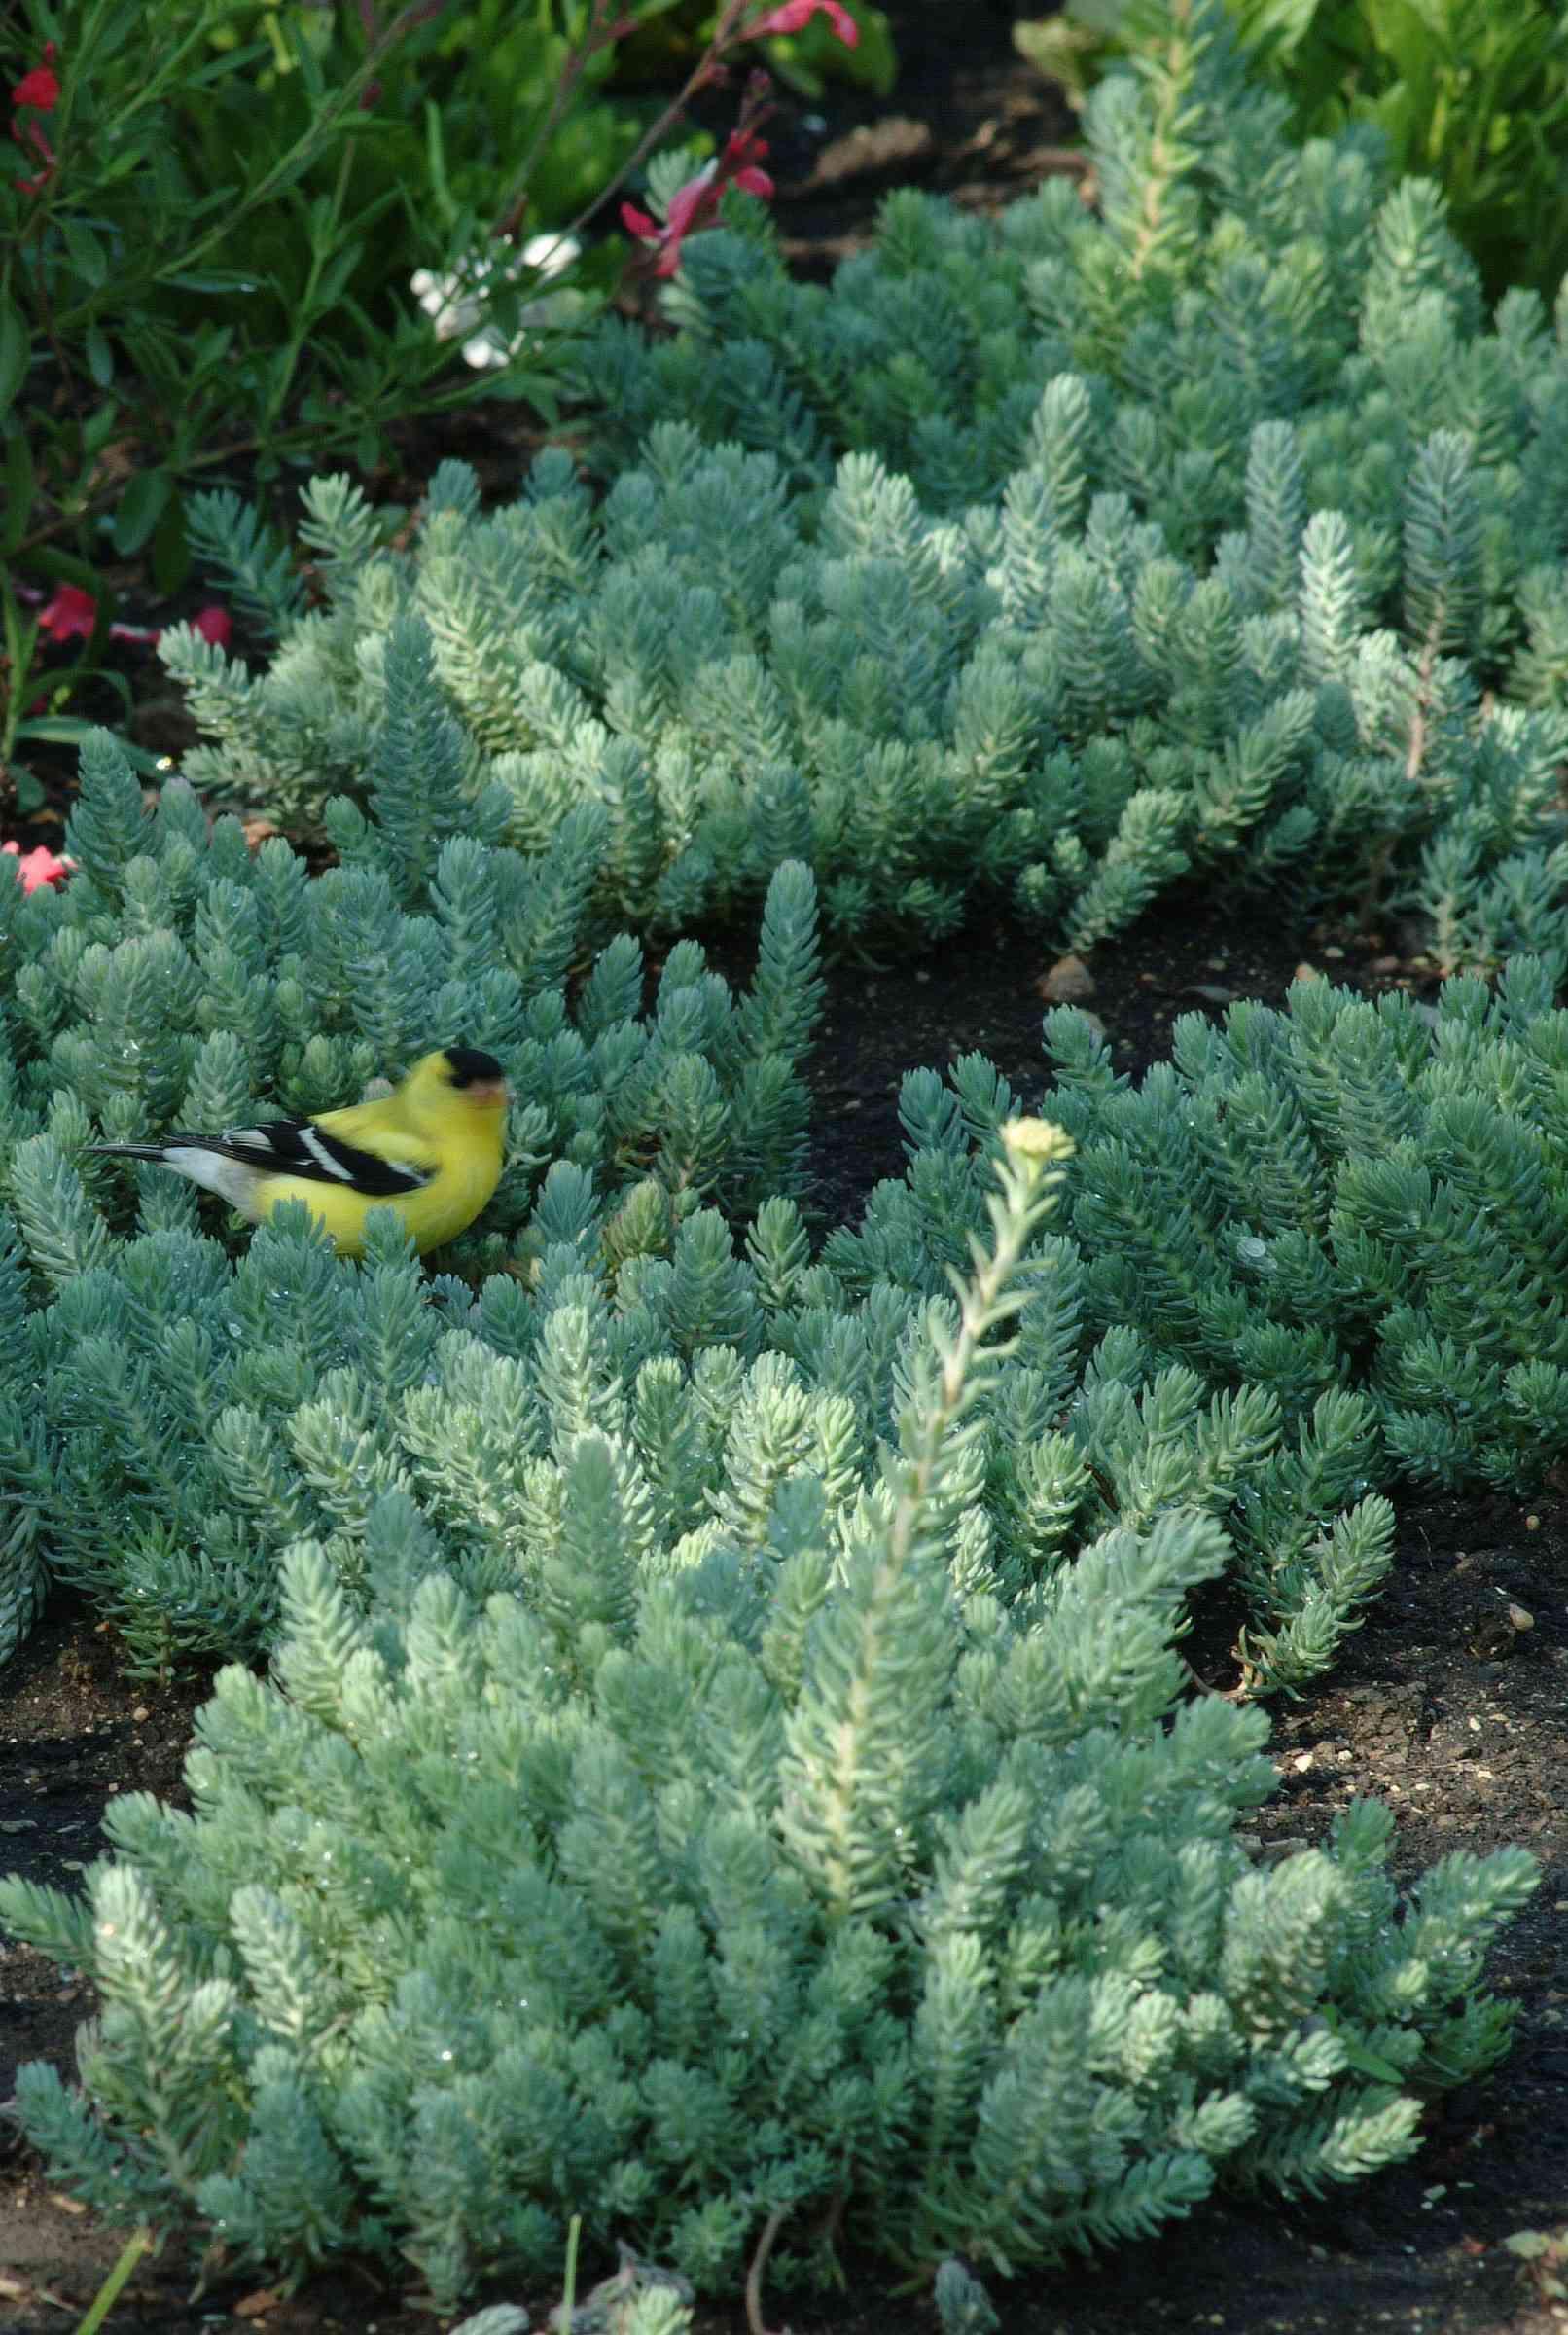 Blue spruce sedum with a yellow bird in its green foliage